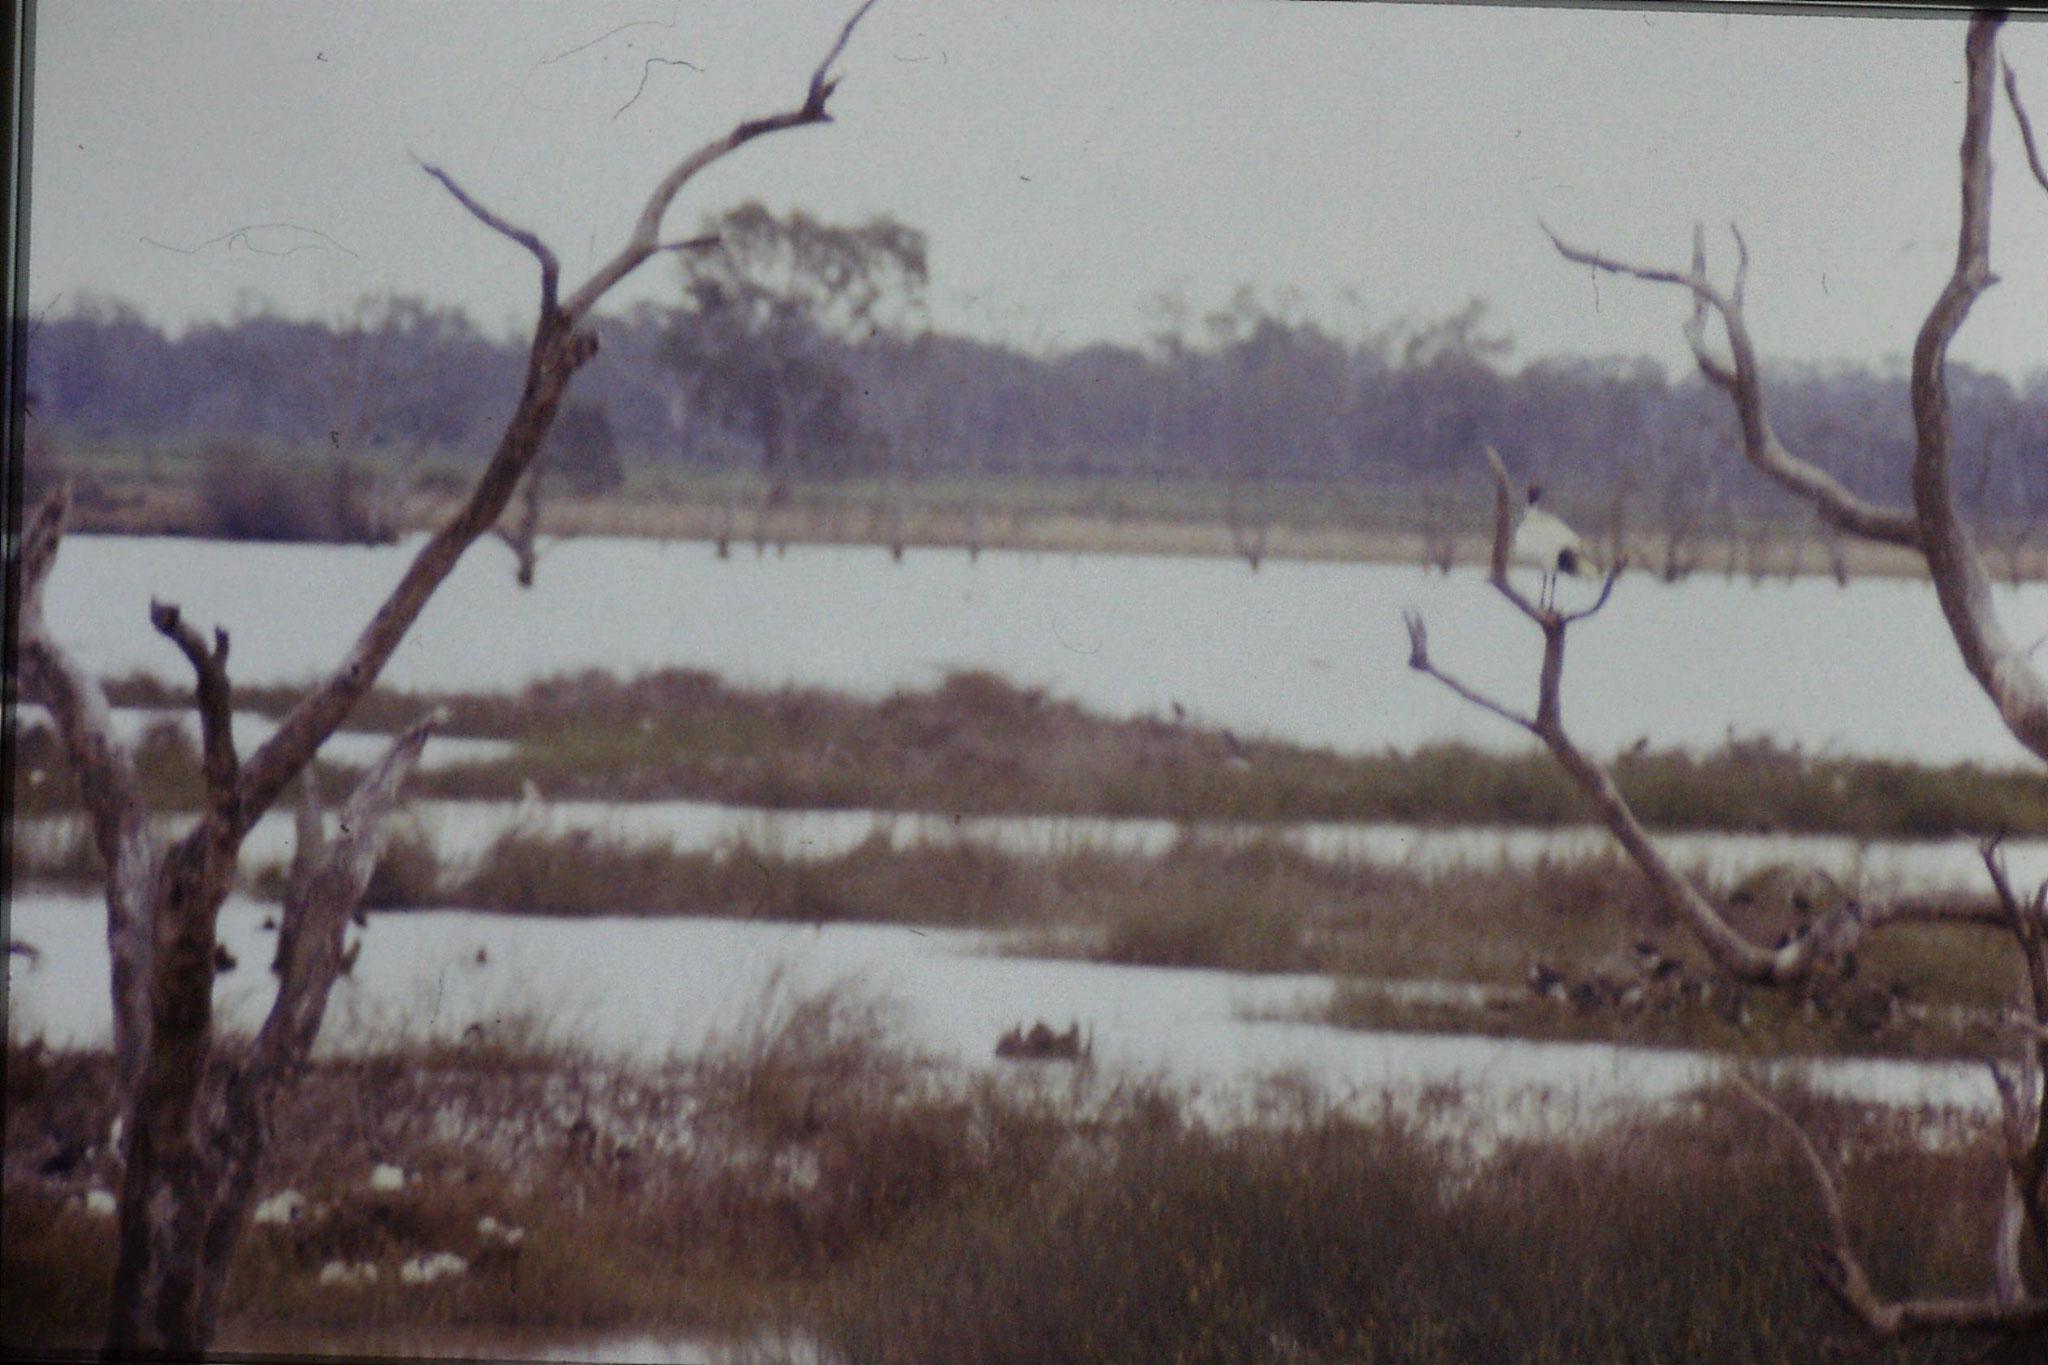 25/9/1990: 20: Kerang, ibis rookery